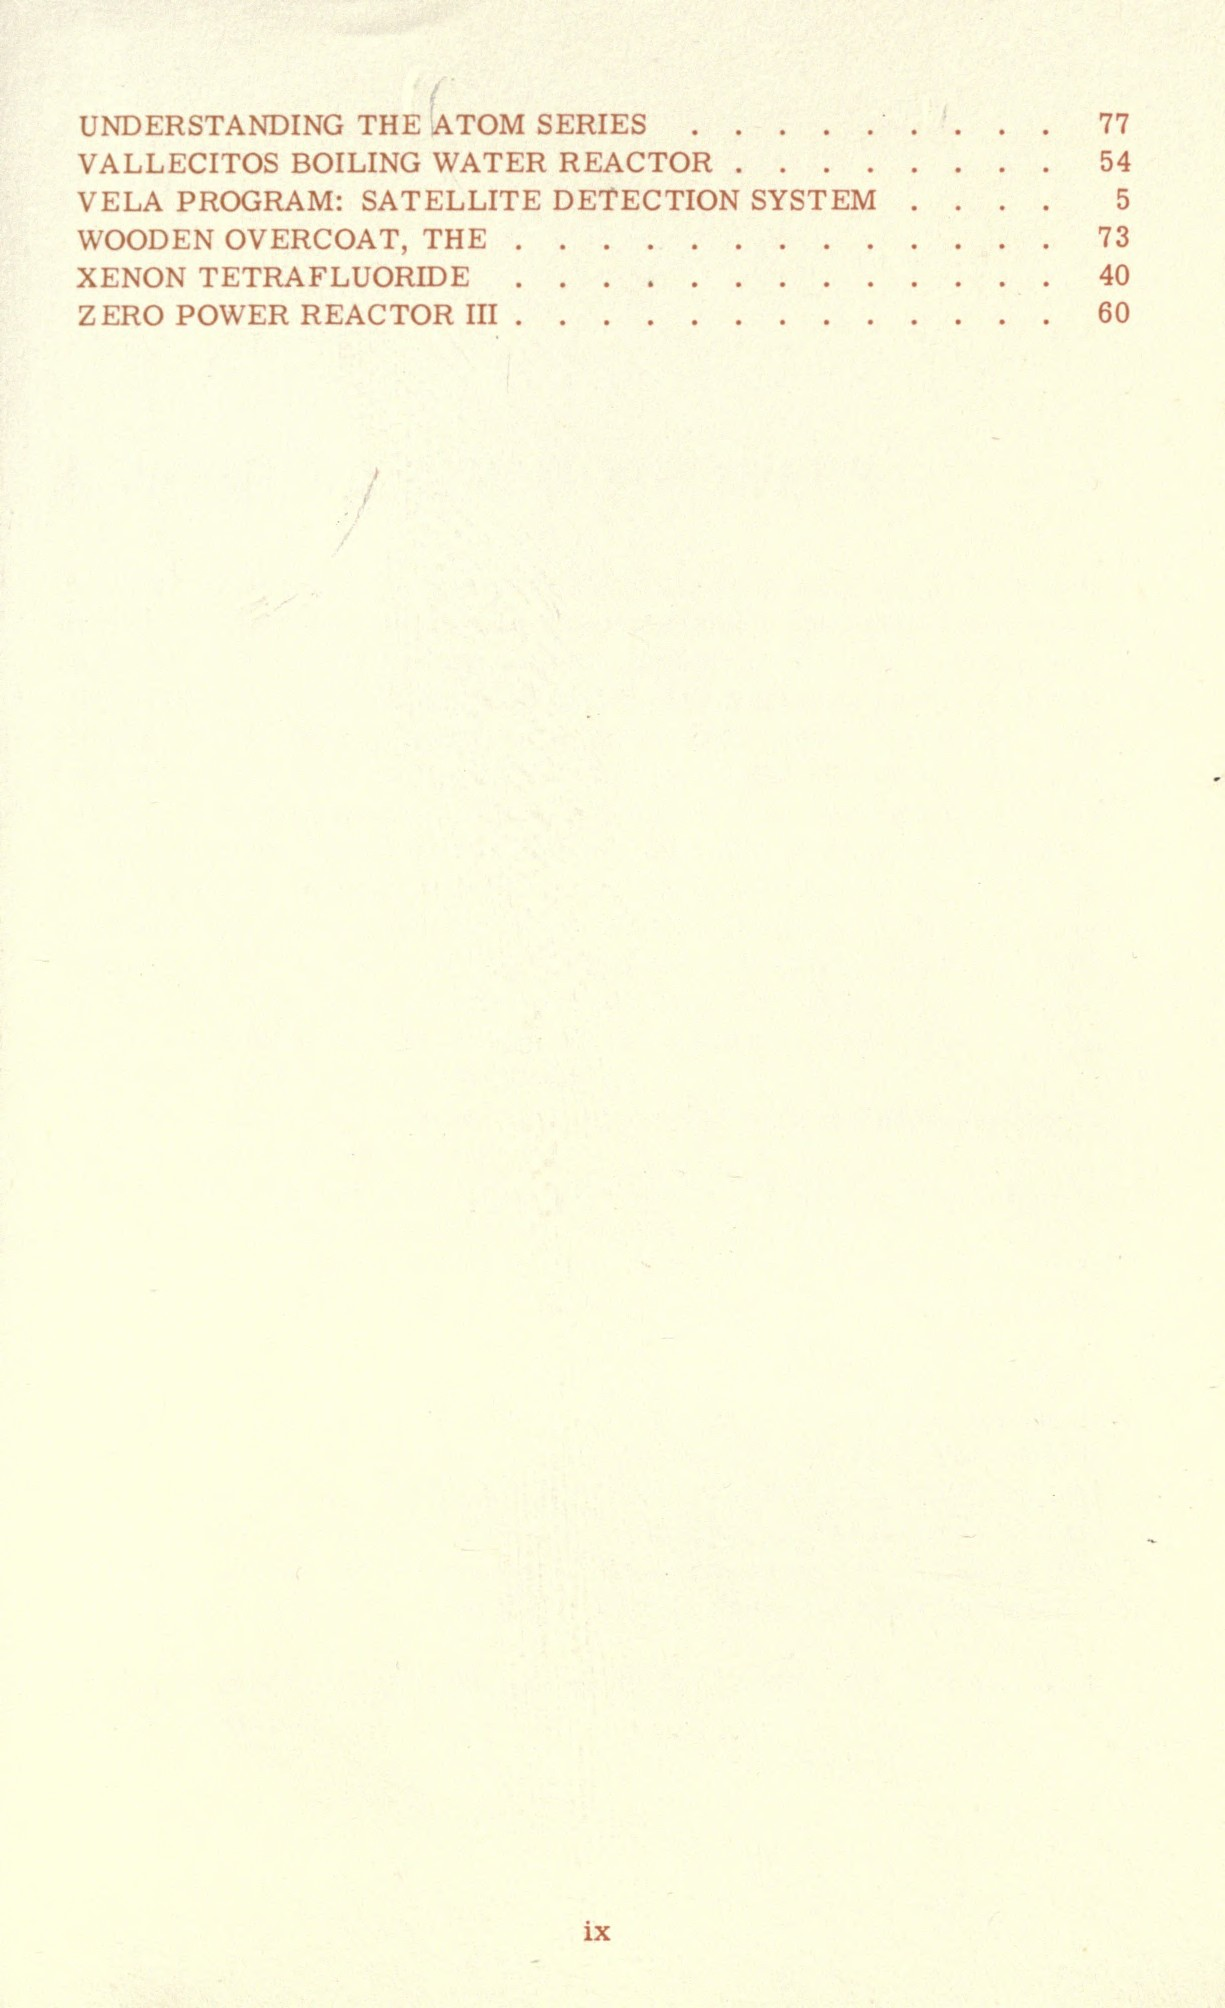 Combined16mmfilm00usatrich_jp2.zip&file=combined16mmfilm00usatrich_jp2%2fcombined16mmfilm00usatrich_0011